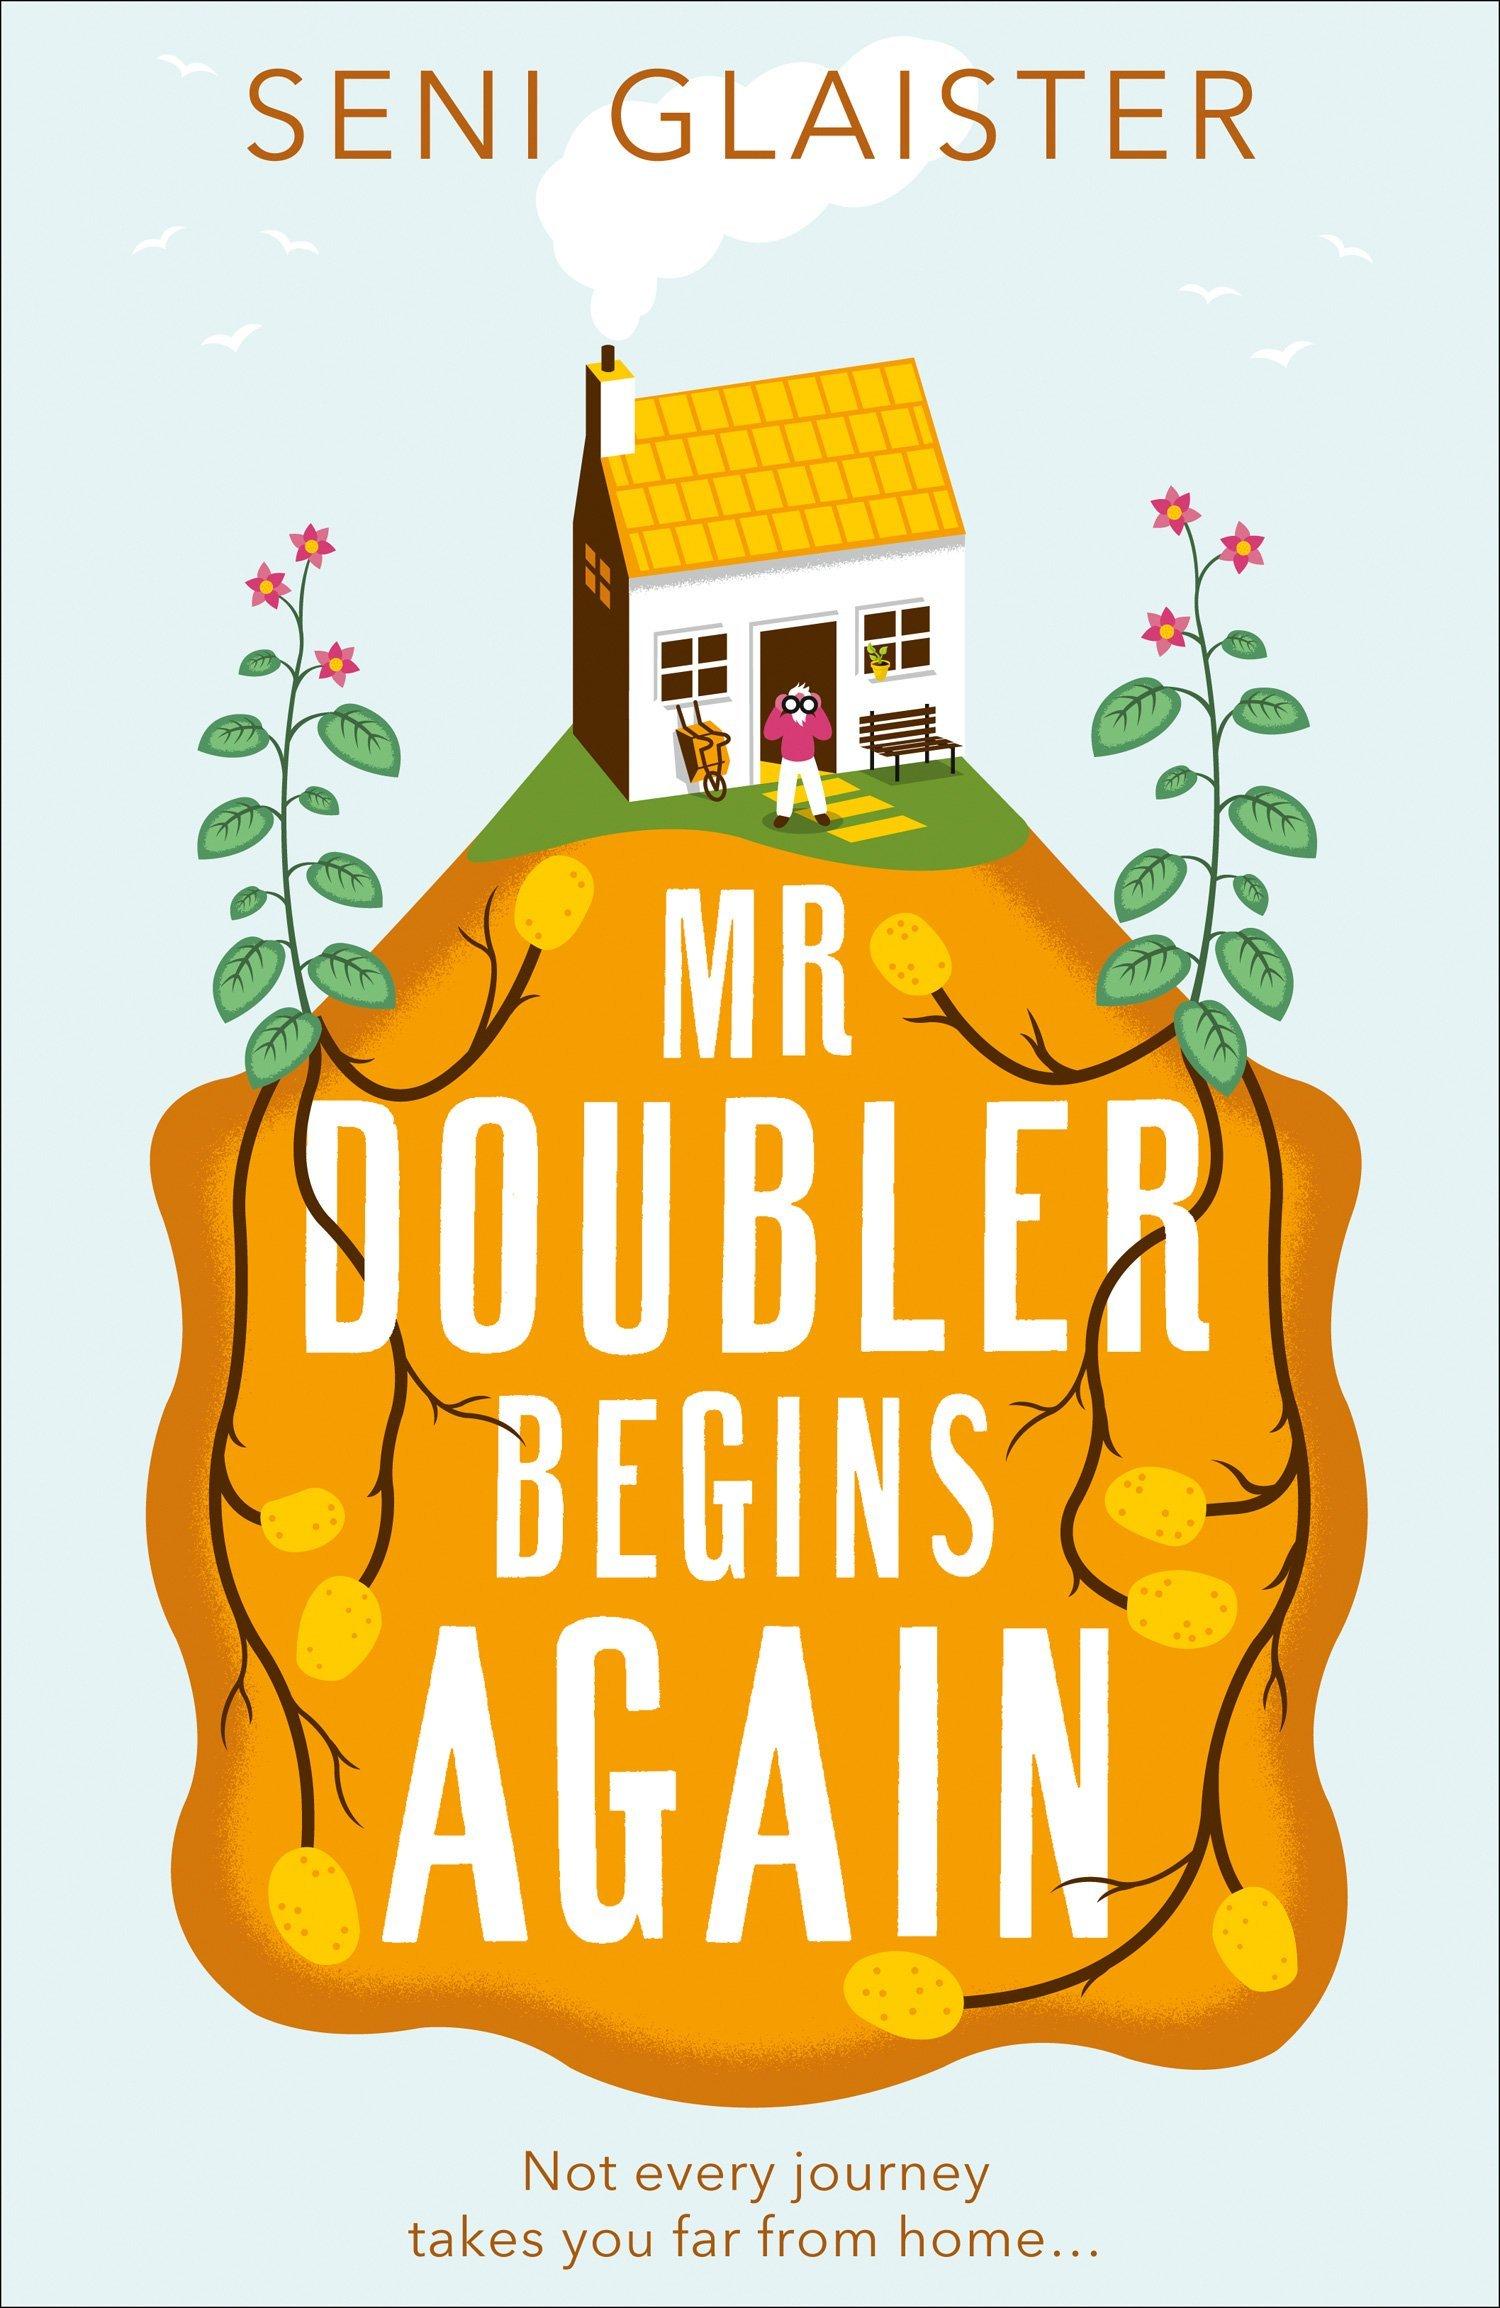 Mr Doubler Begins Again by Seni Glaister